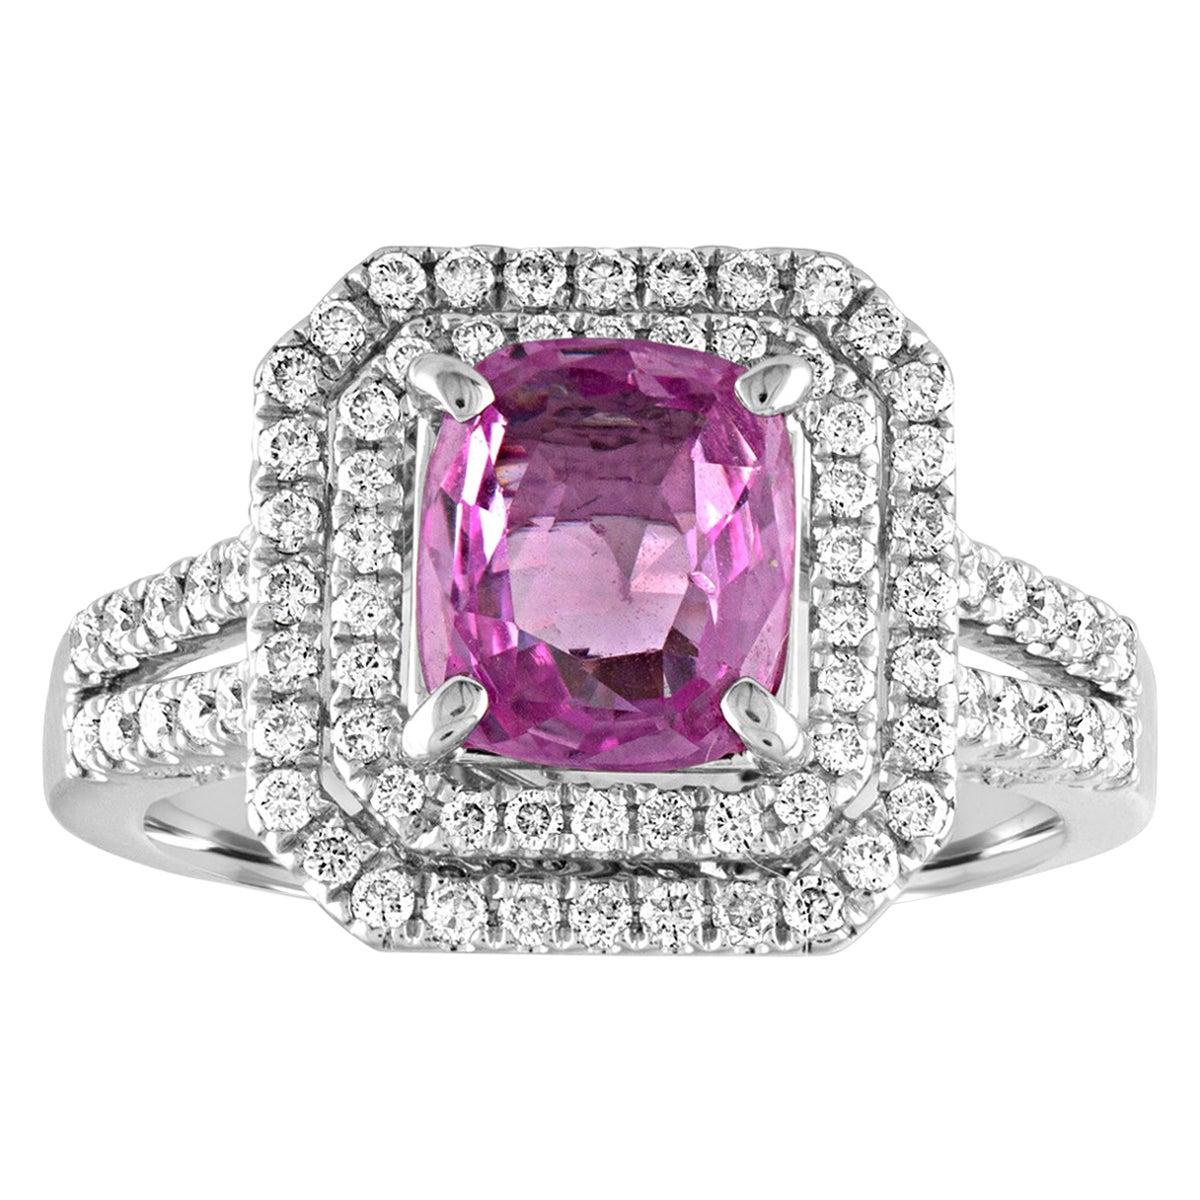 1.90 Carat Cushion Cut Pink Sapphire Diamond Gold Ring